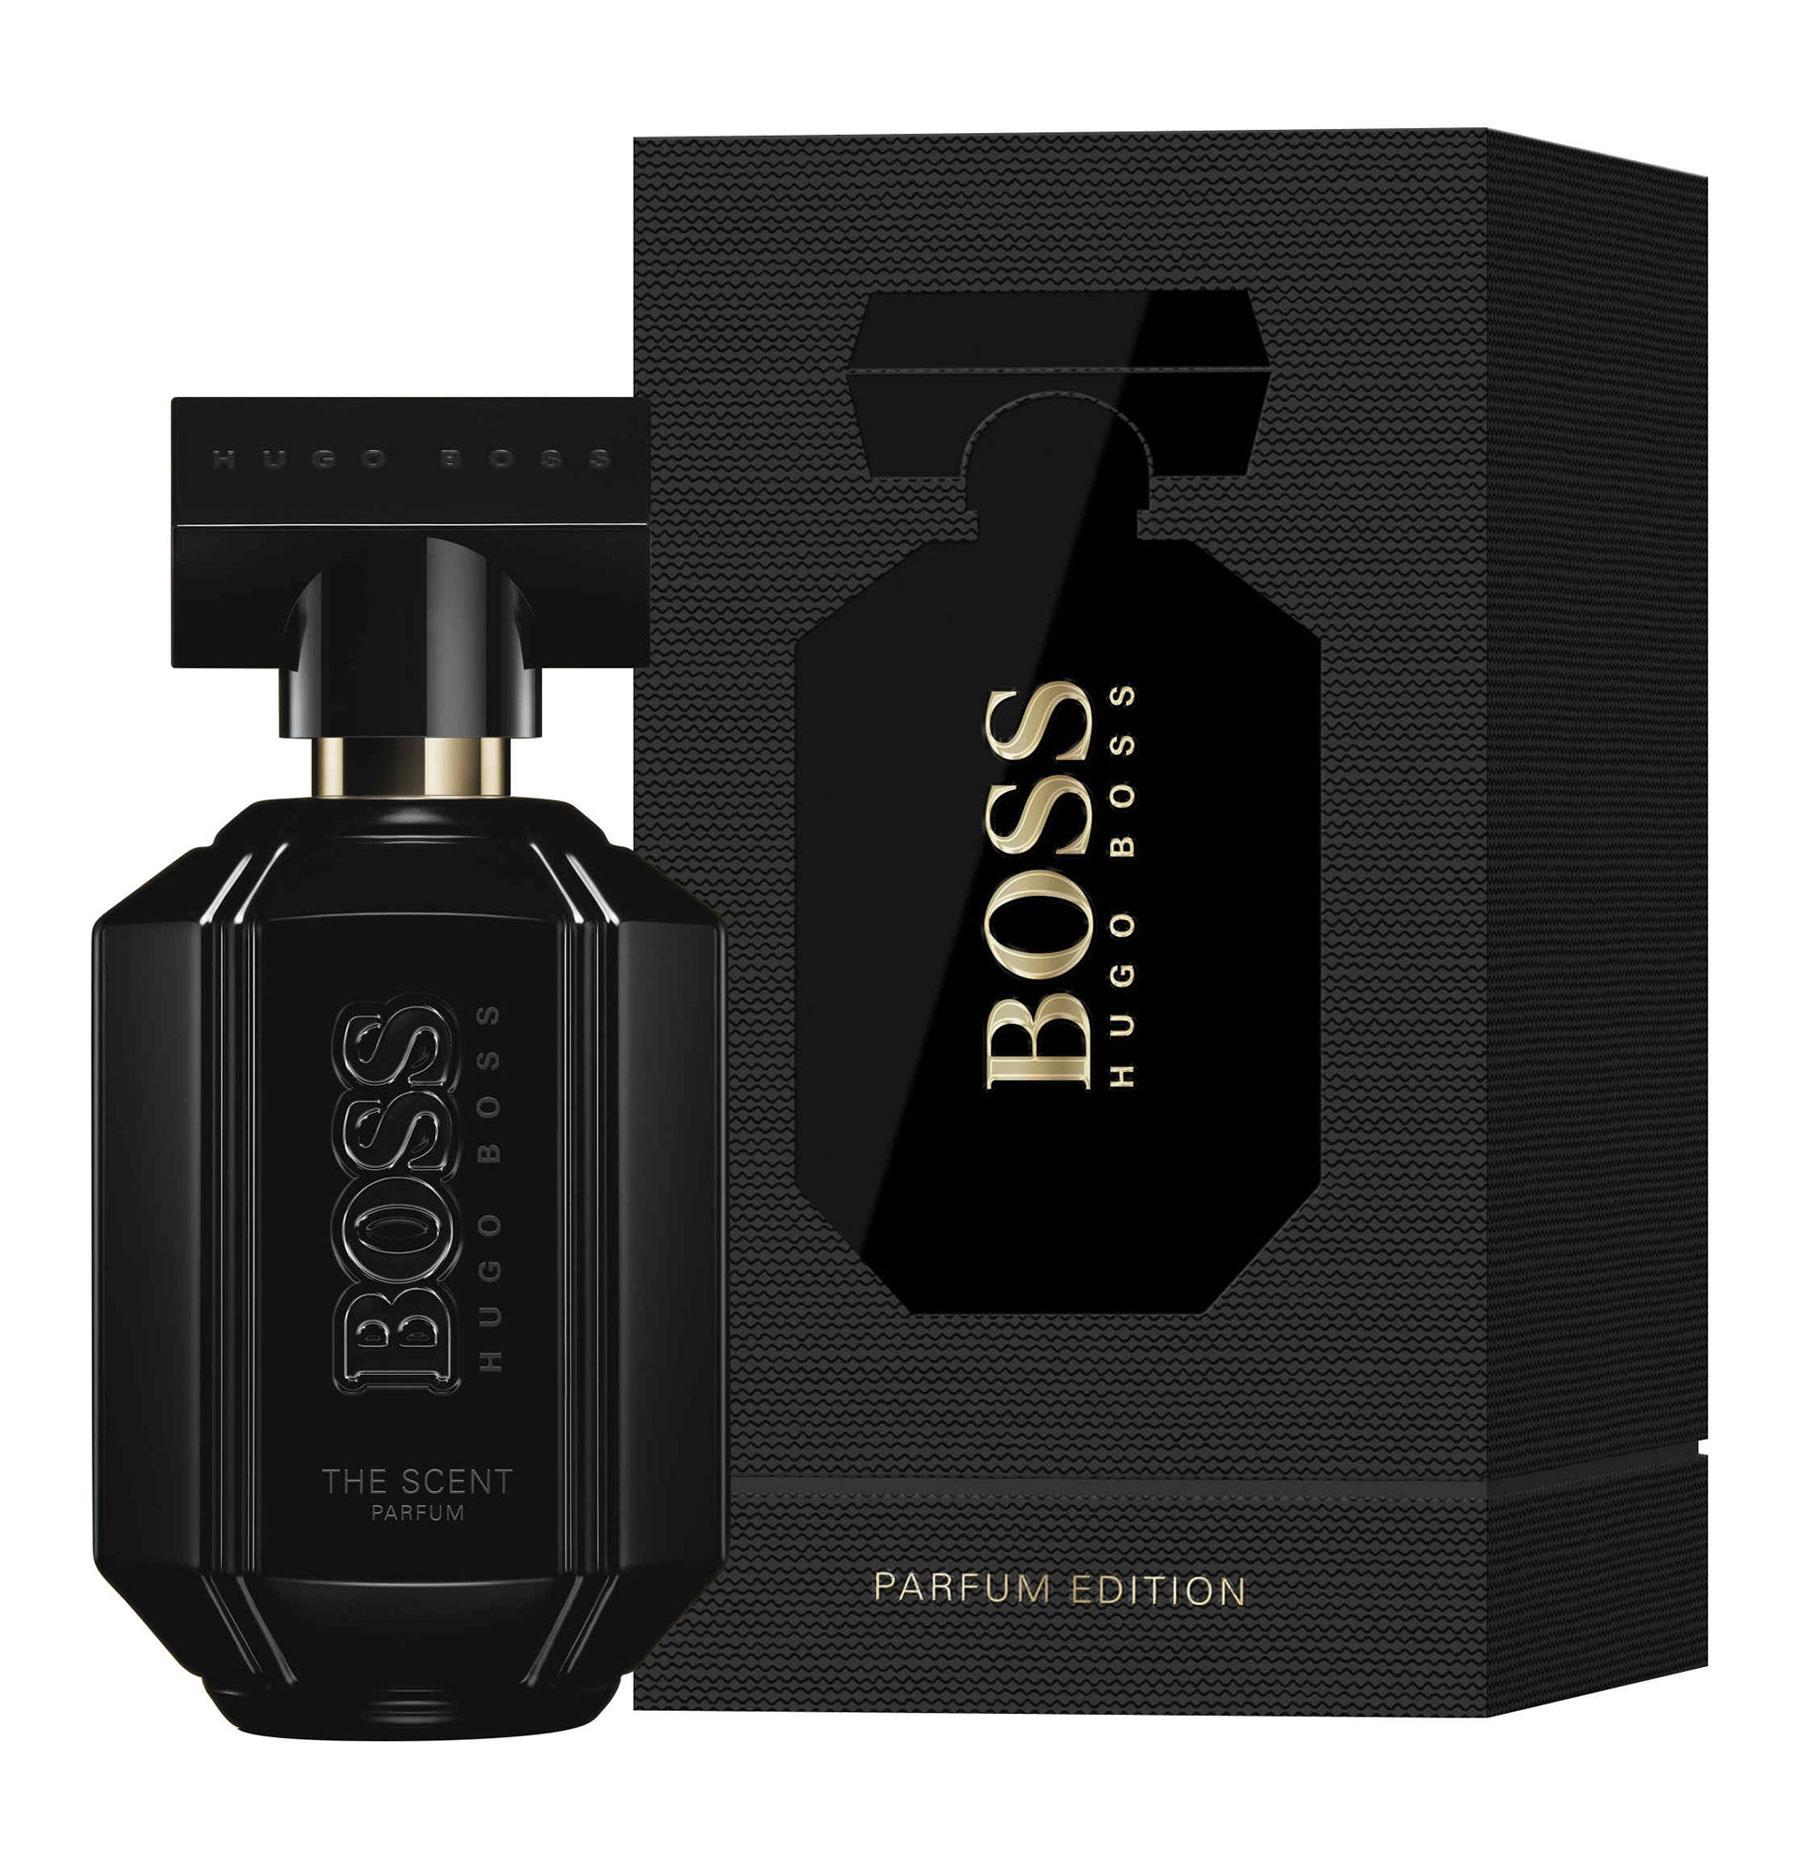 Hugo Boss Boss The Scent Parfum Editions New Fragrances